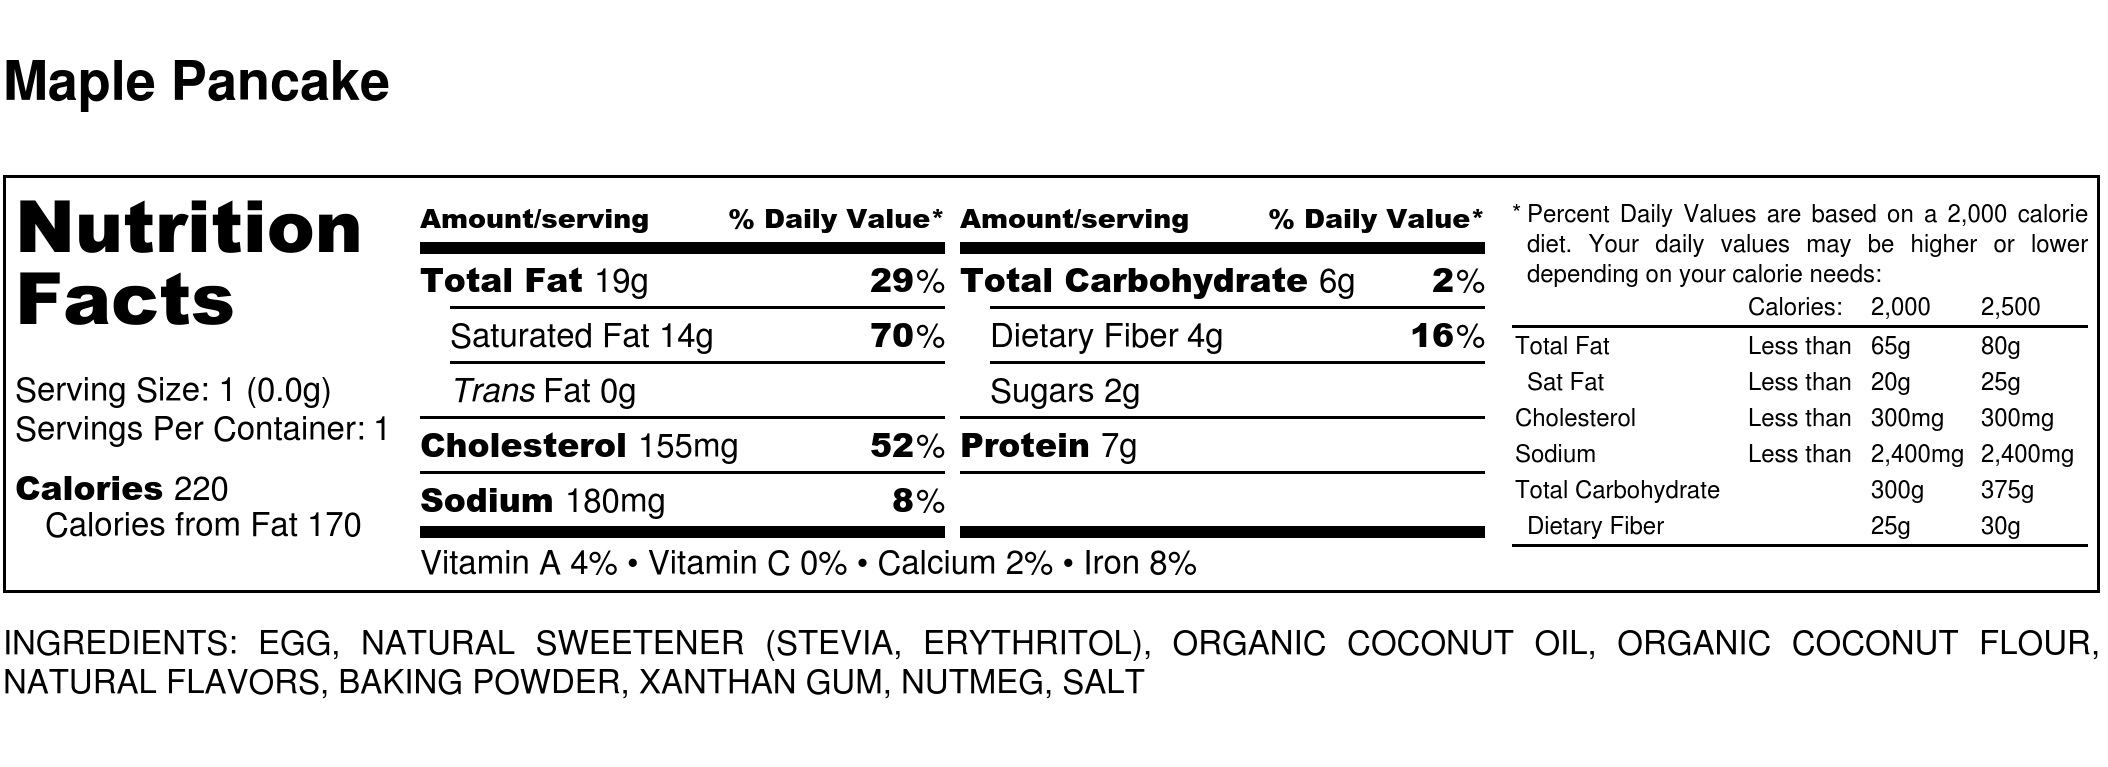 maple-pancake-nutrition-label.jpg